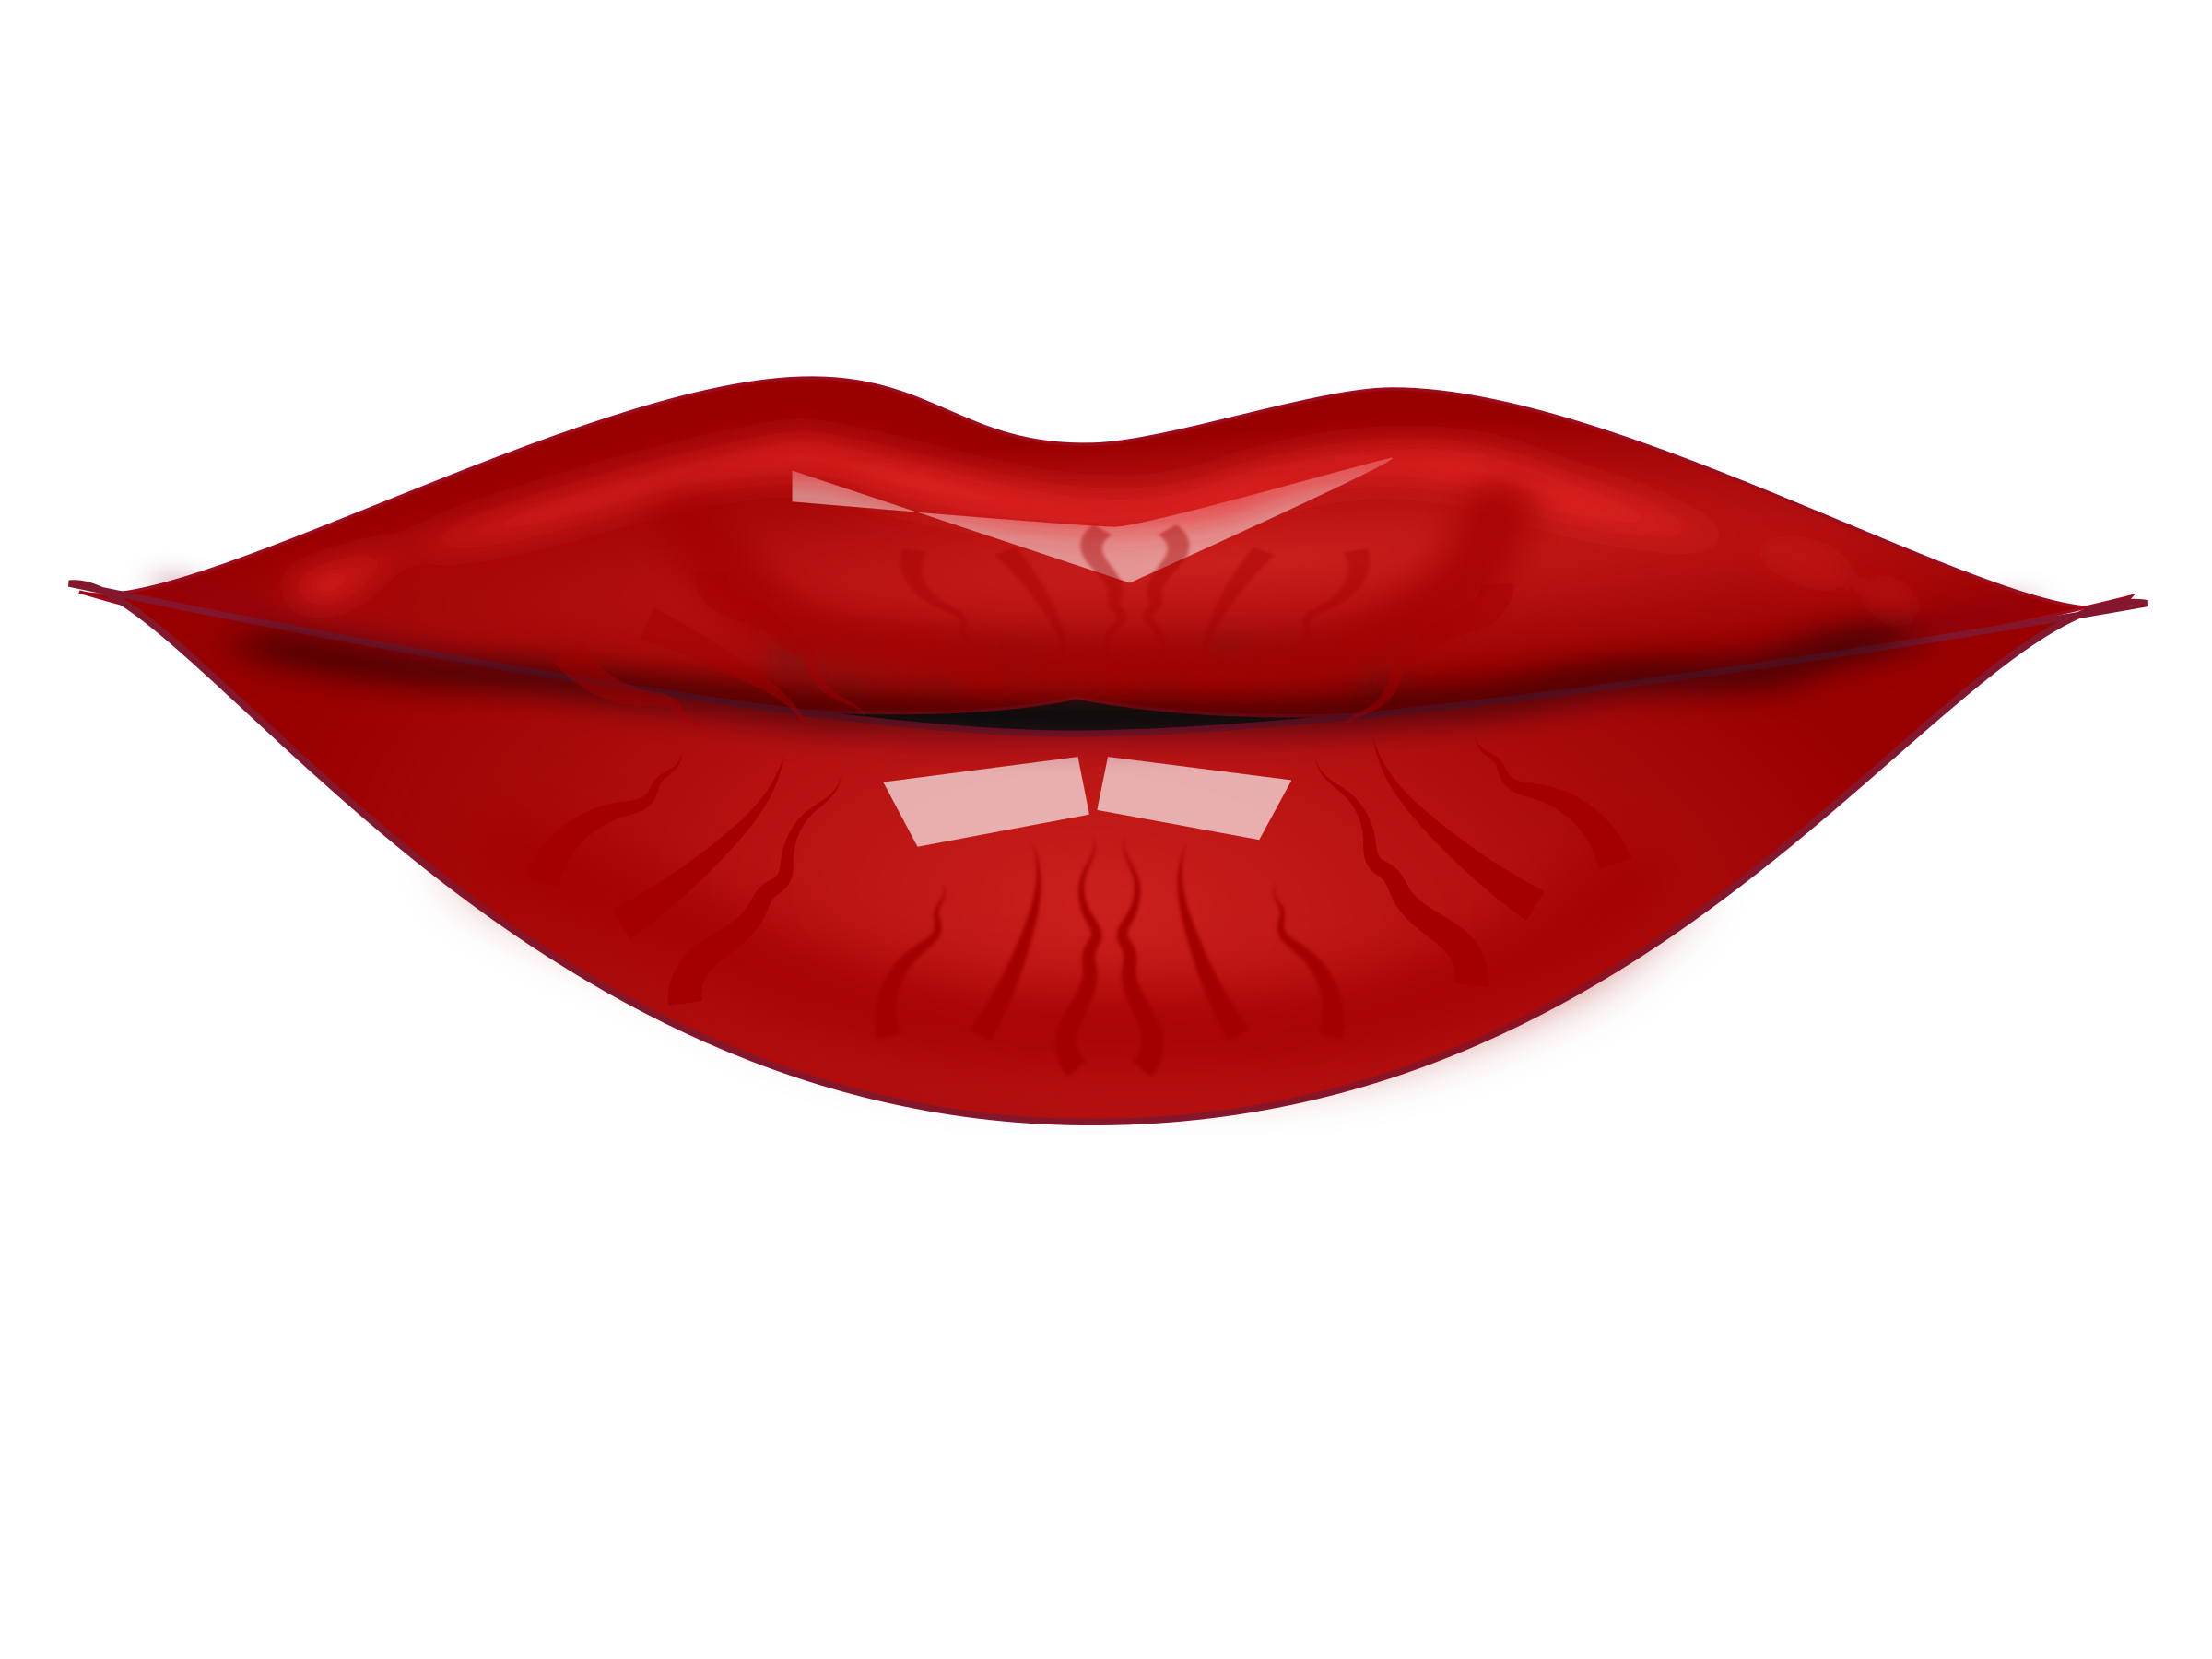 2400x1800 Lips Clip Art Amp Lips Clipart Images